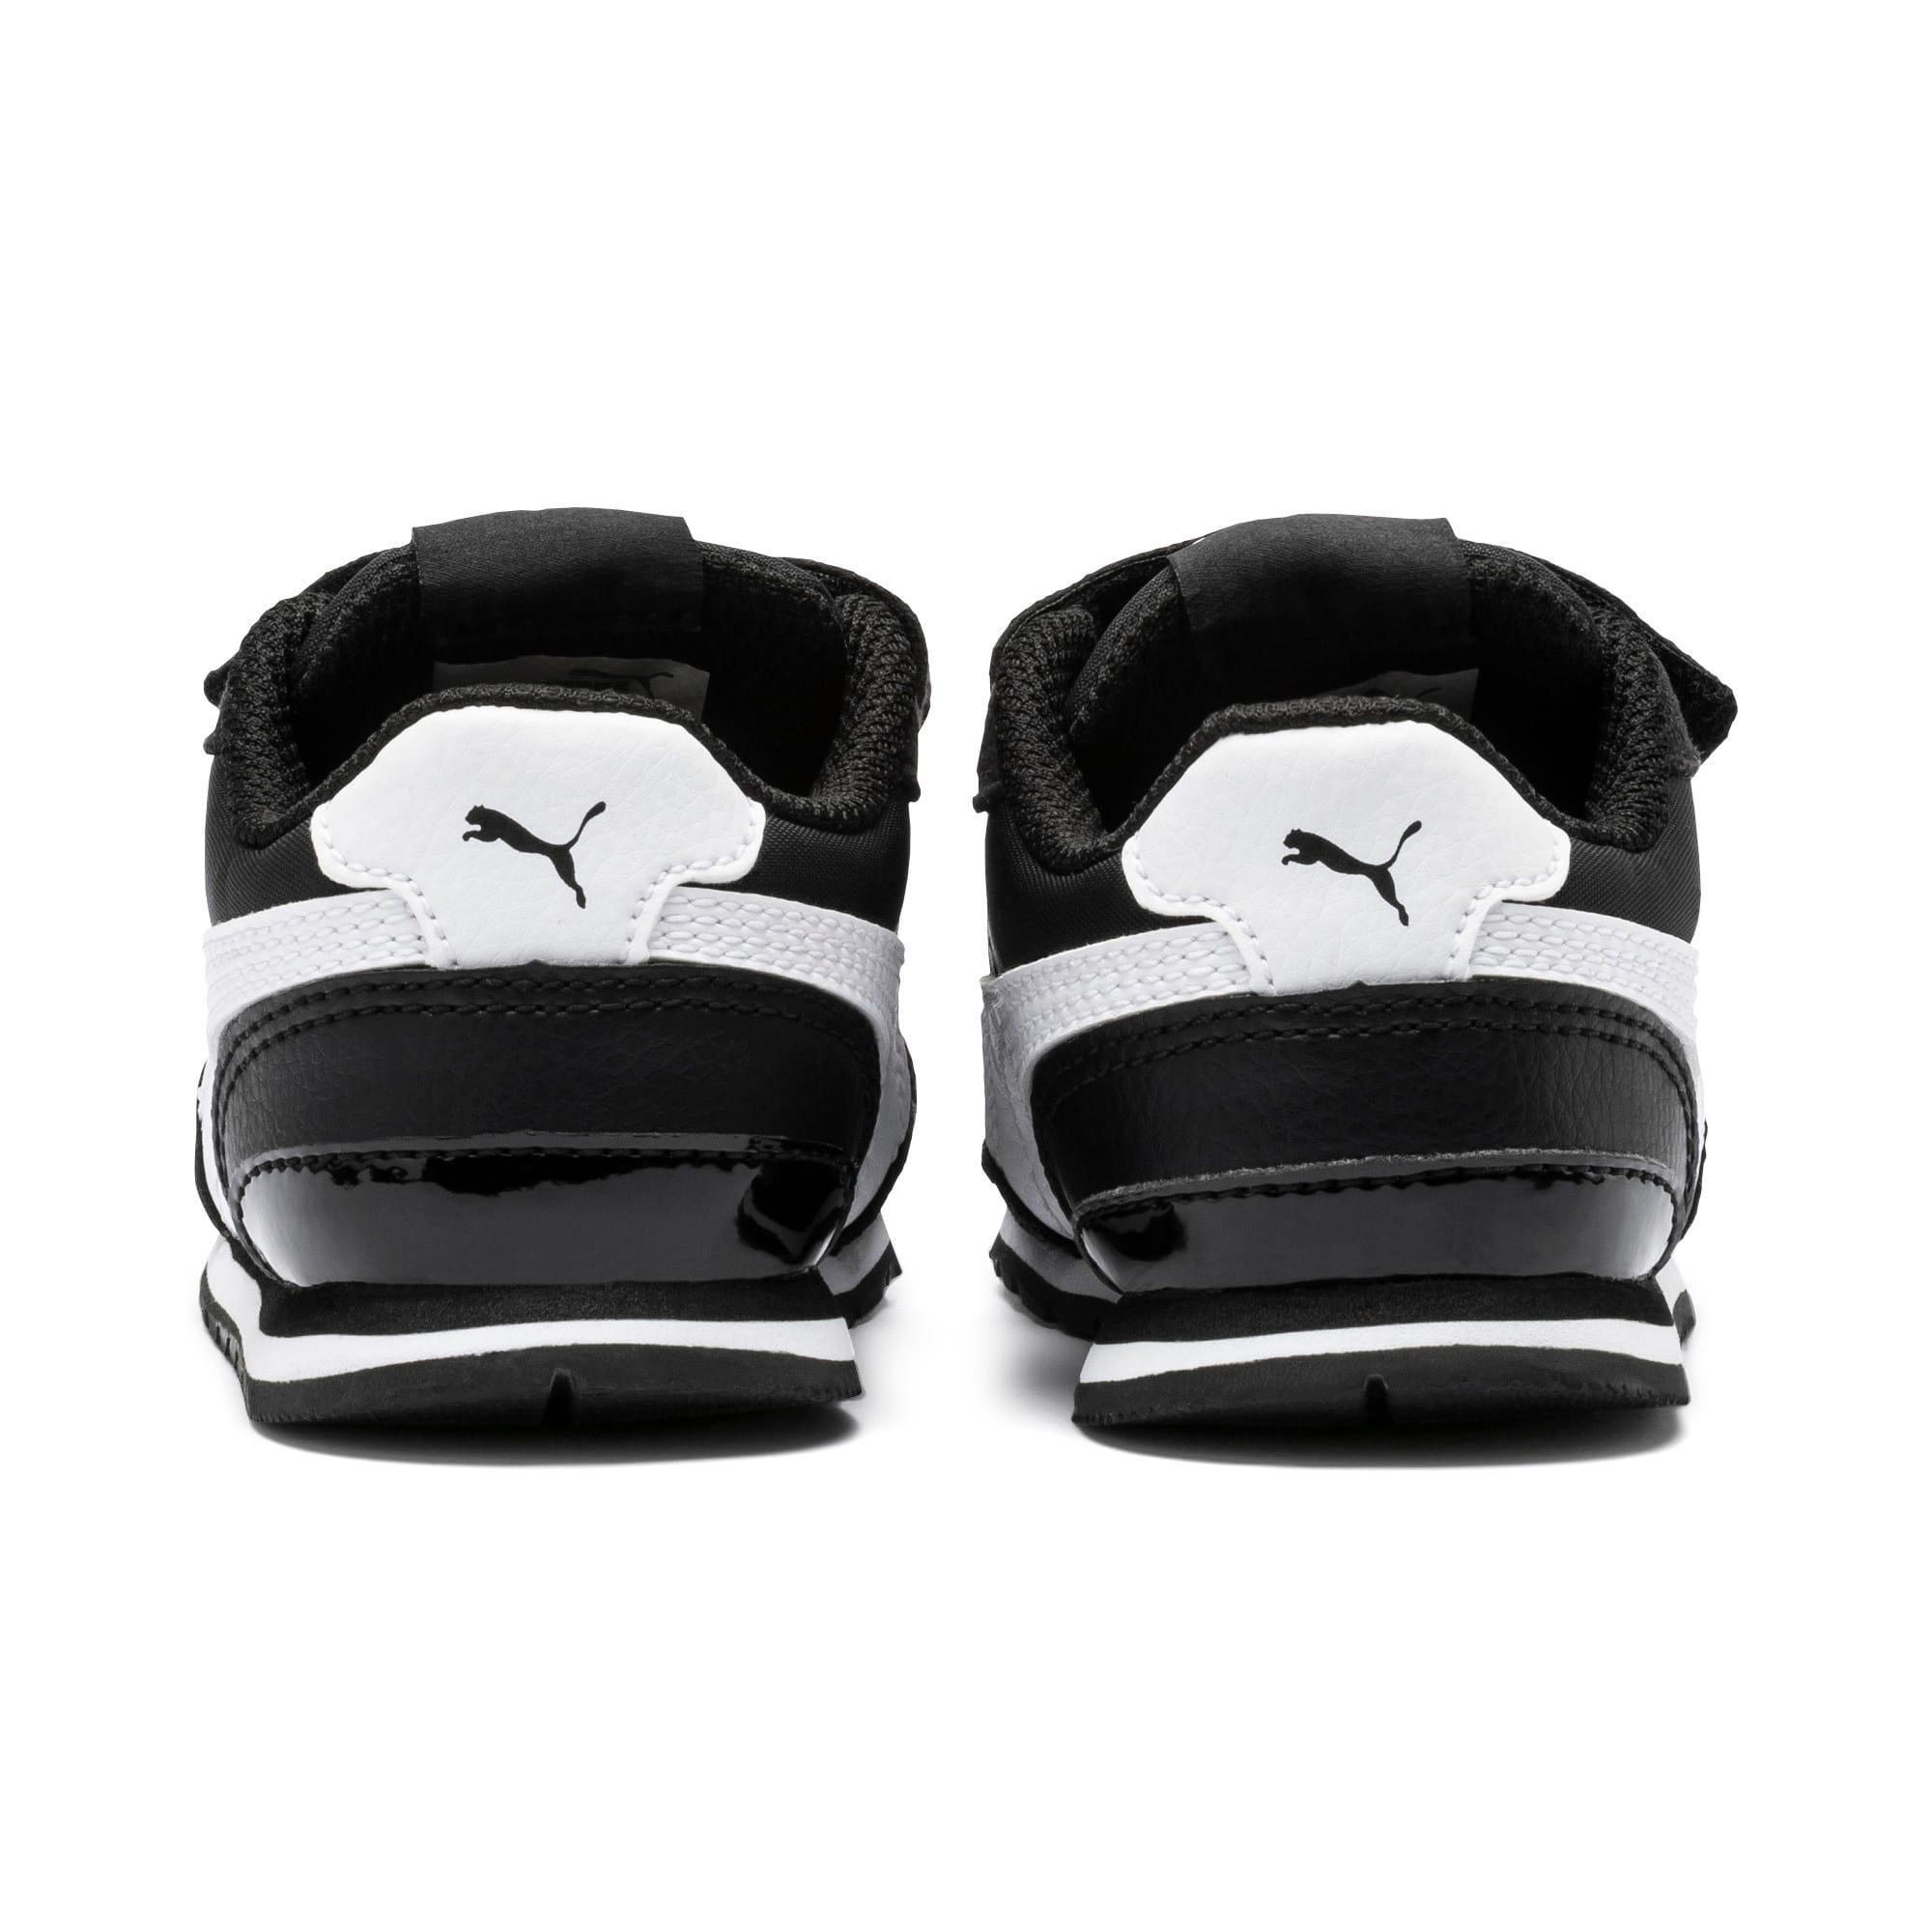 Thumbnail 3 of ST Runner V2 V Toddler Shoes, Puma Black-Puma White, medium